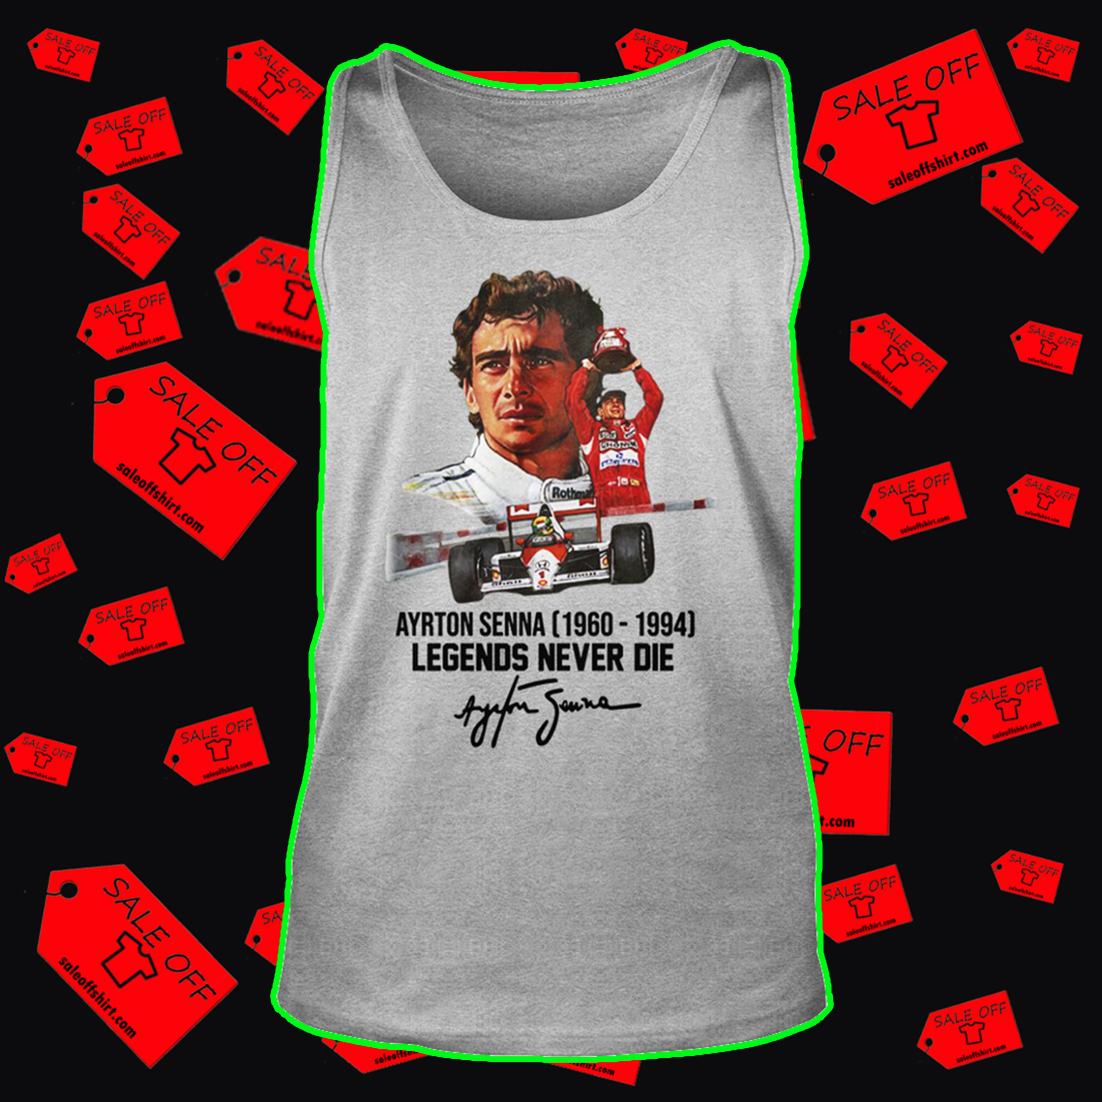 Ayrton Senna legends never die signature tank top